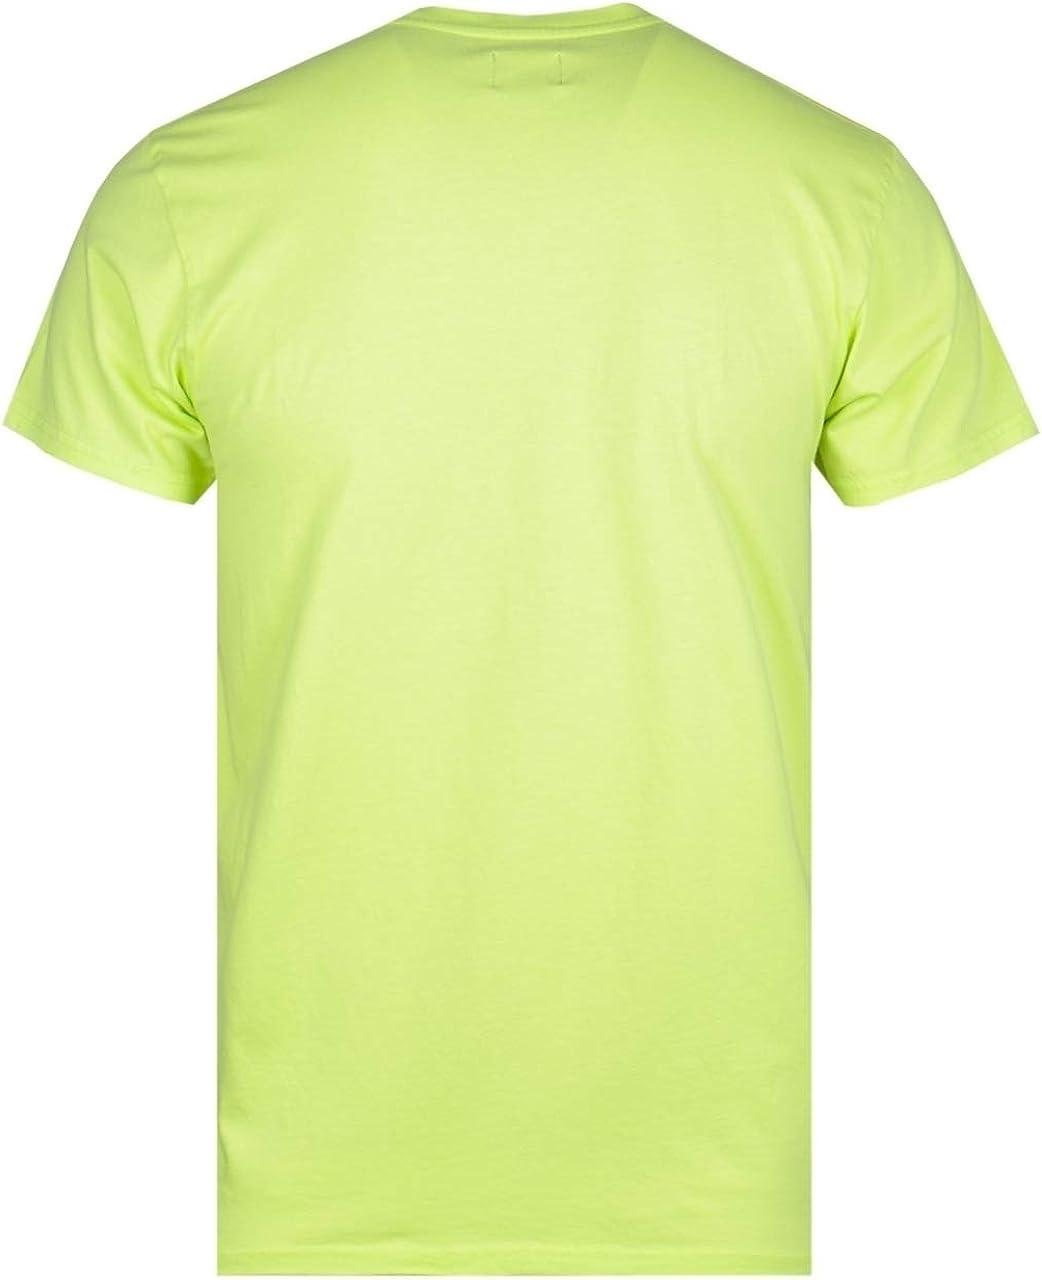 Edwin Lime Green Garment Washed Pocket Tee